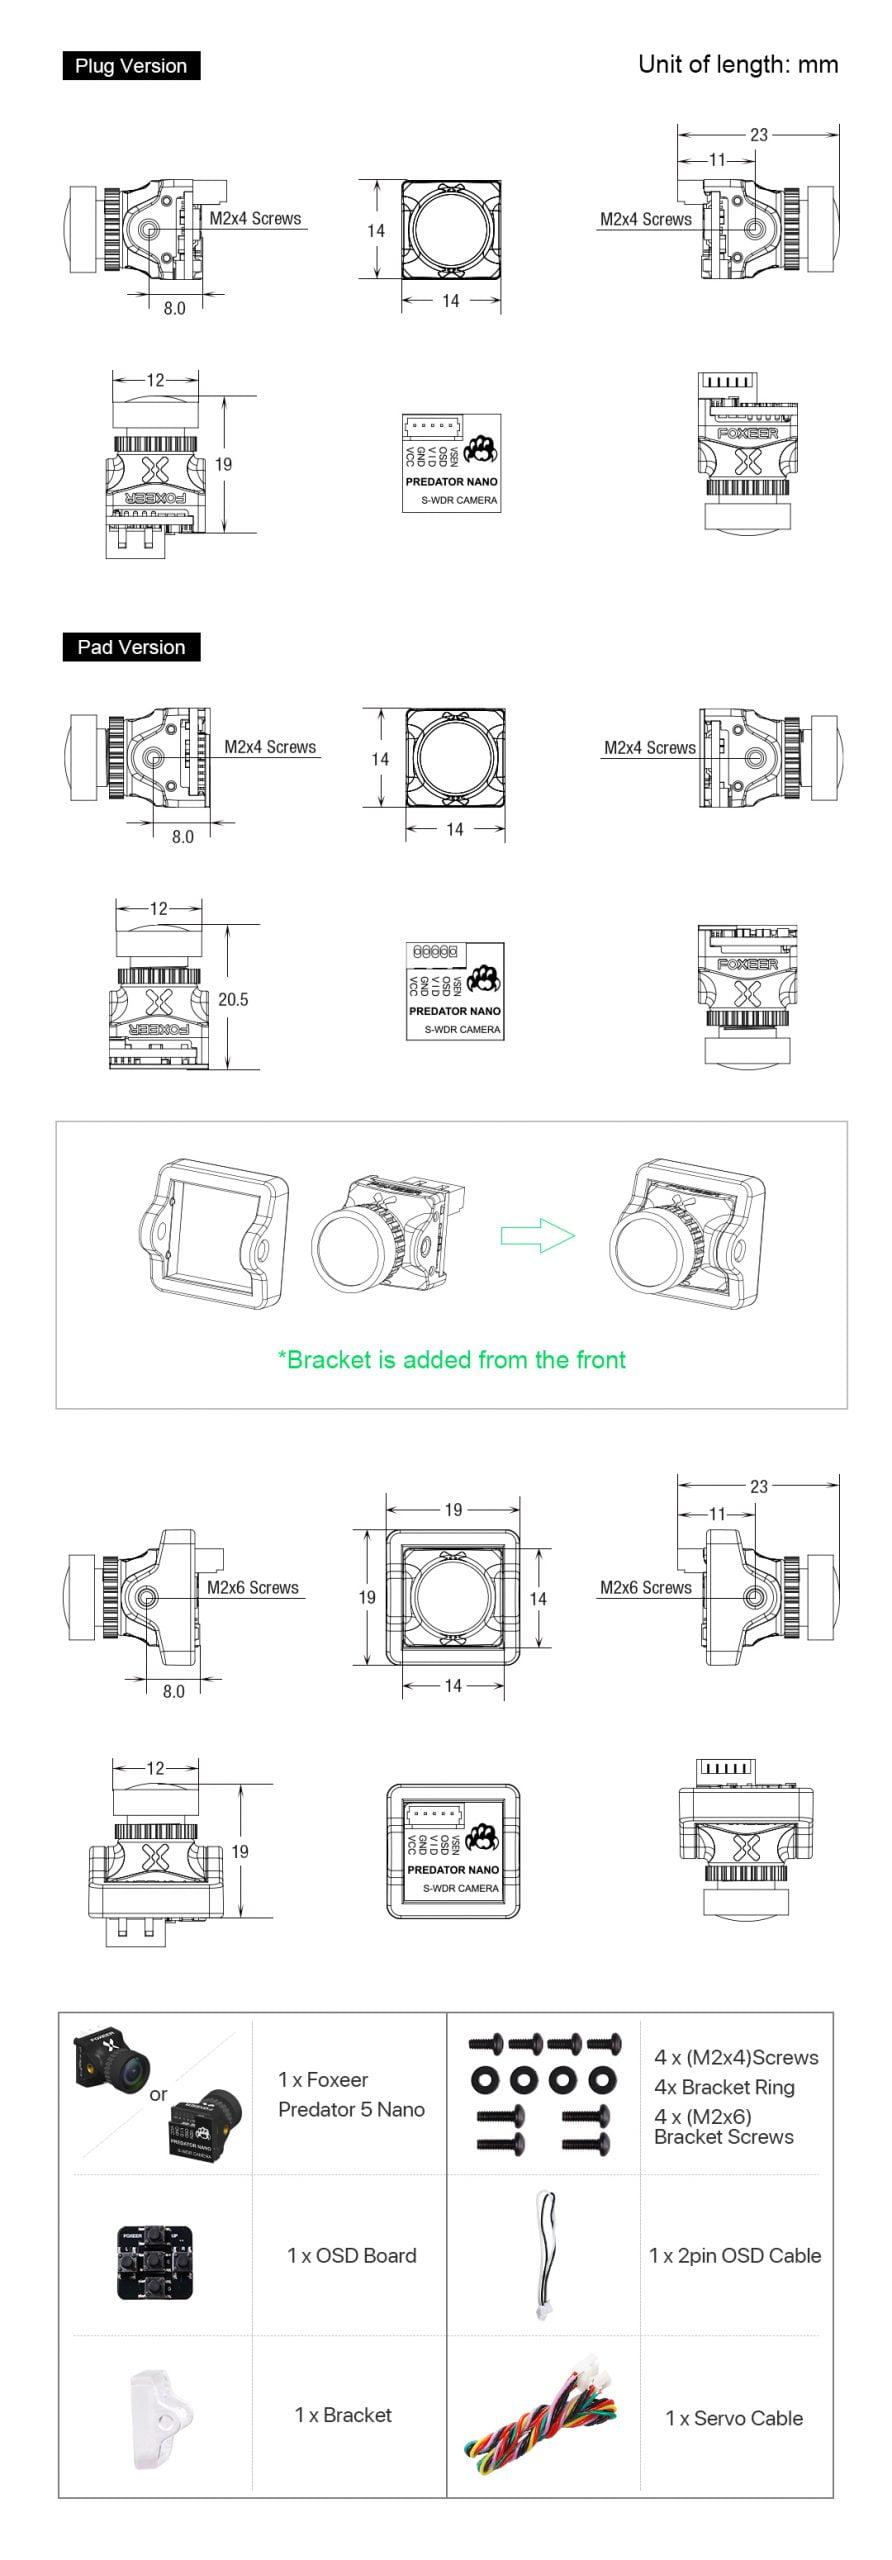 foxeer predator nano v5 m8 1000tvl 1 8mm fpv camera australia mantisfpv includes scaled